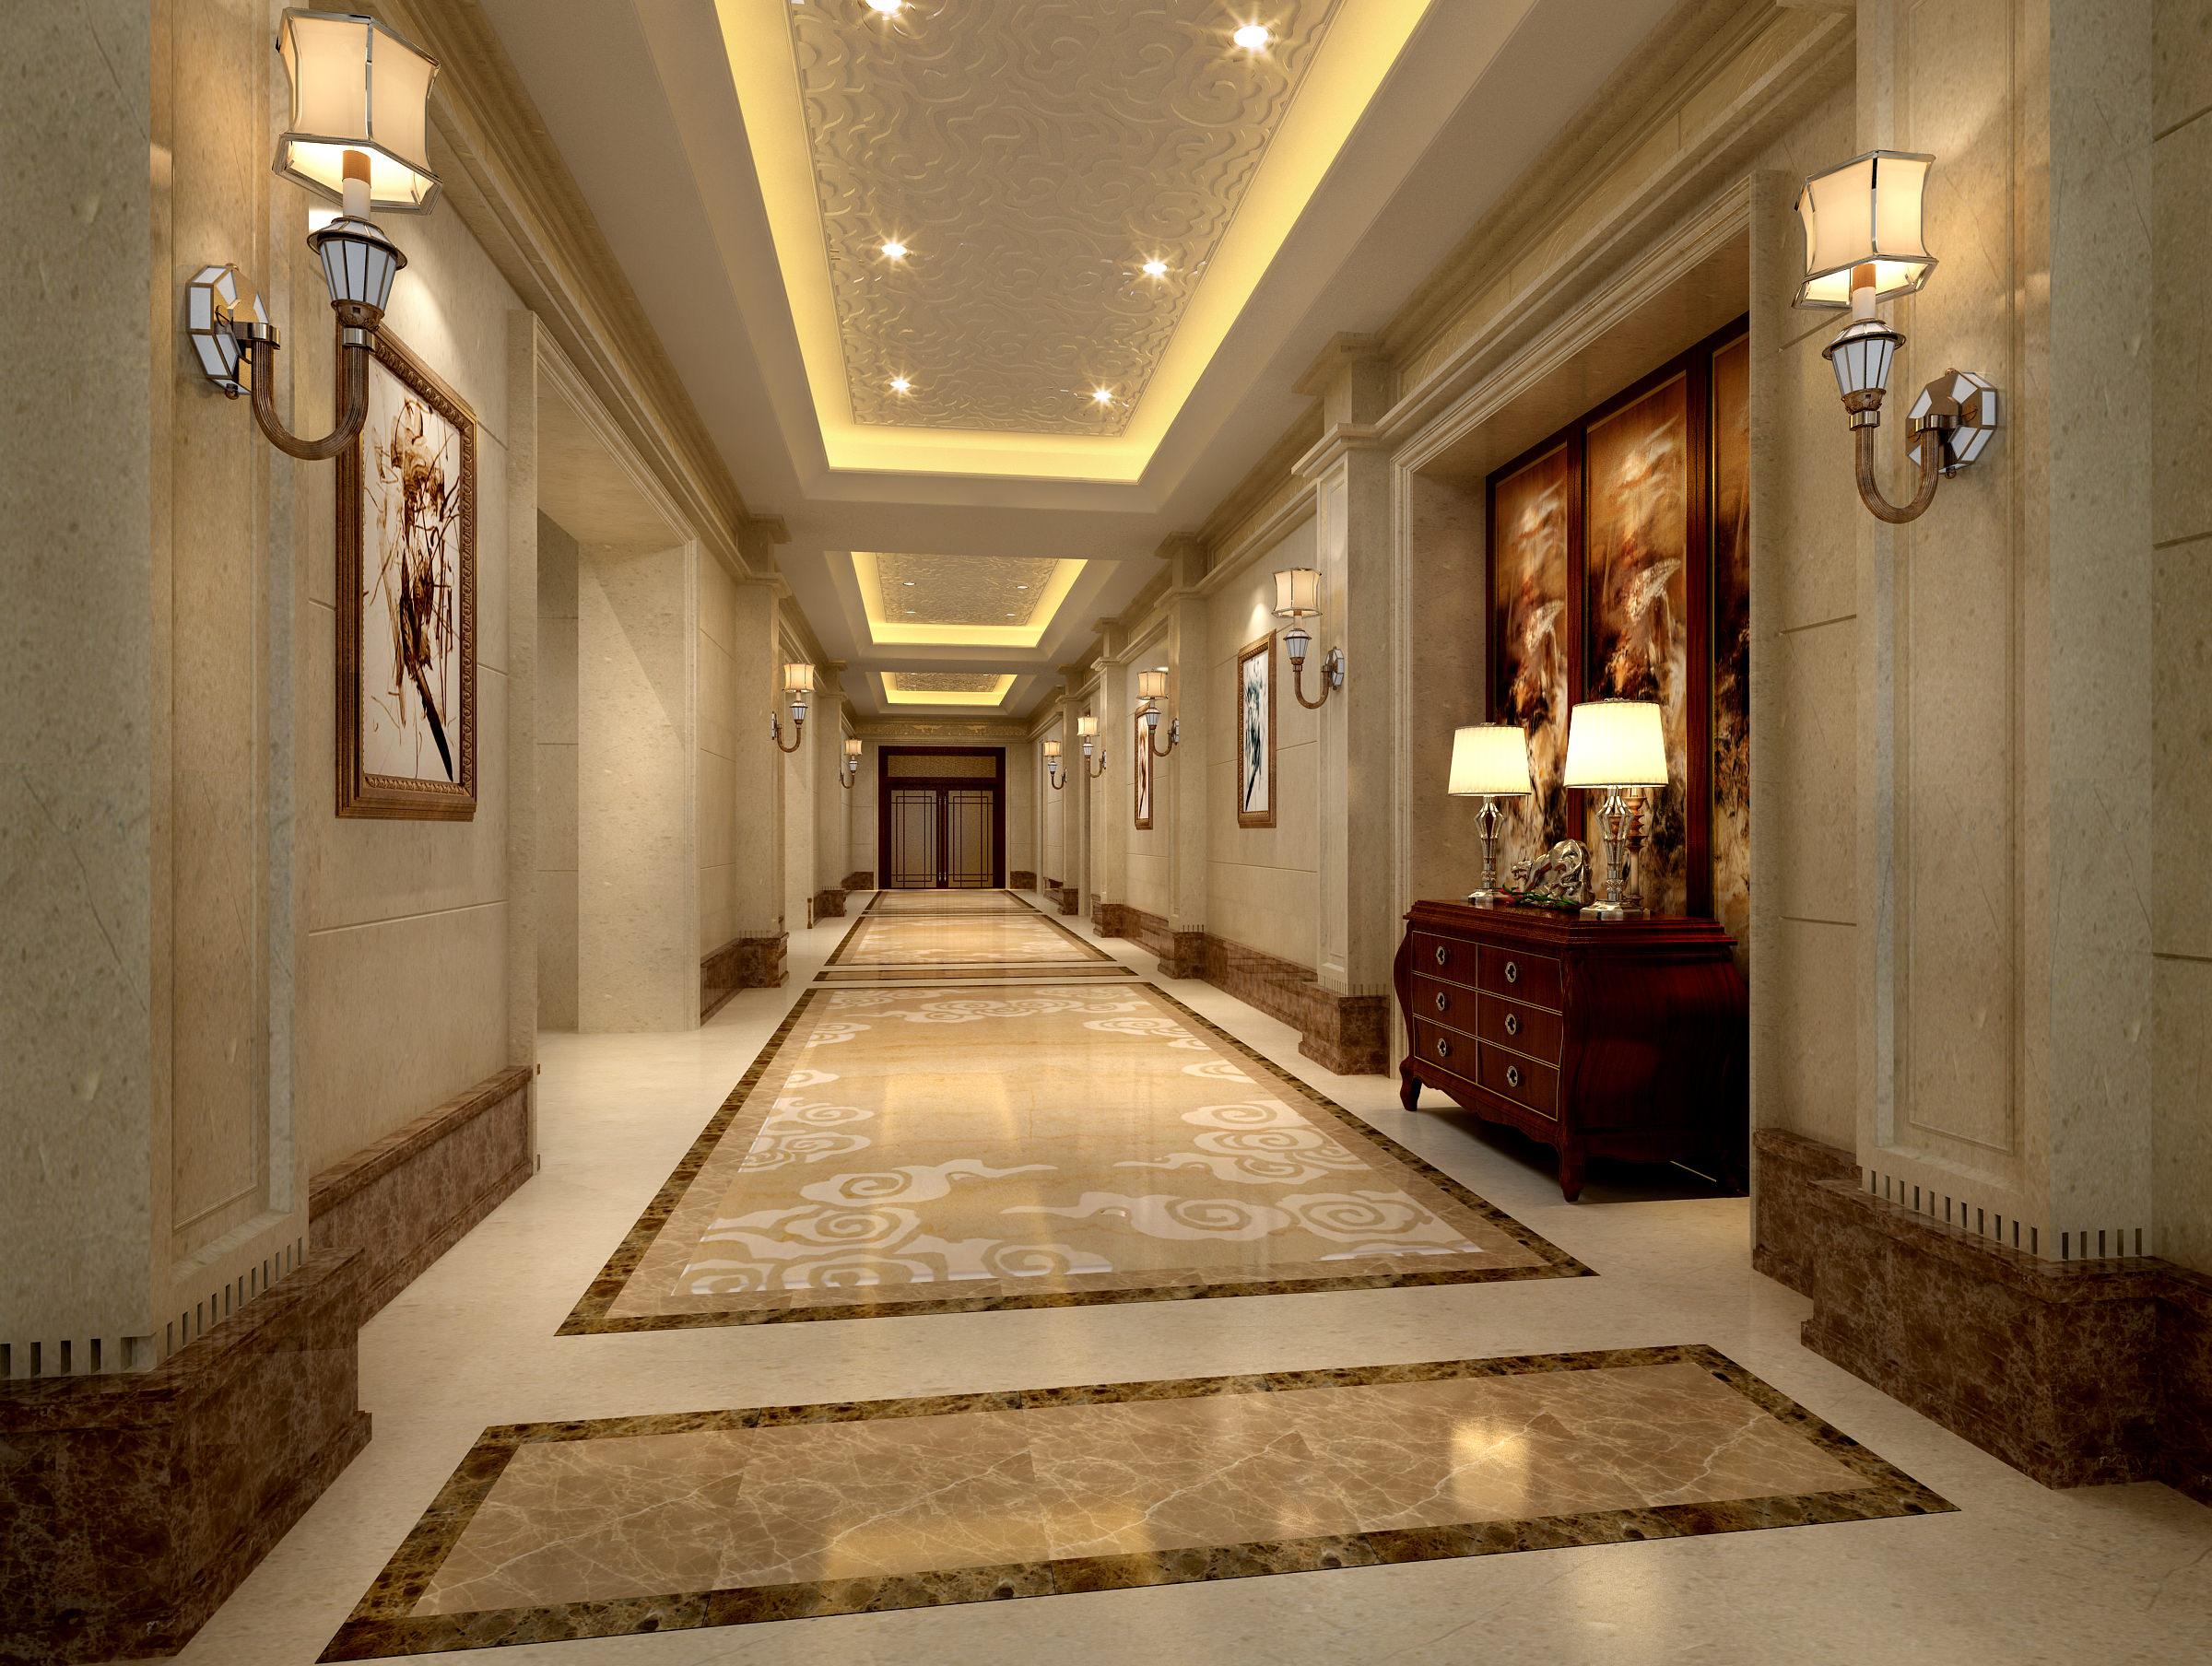 3d rendering luxury hotel lobby china luxury china hotel lobby - Luxury Corridor Hall 3d Model Max 1